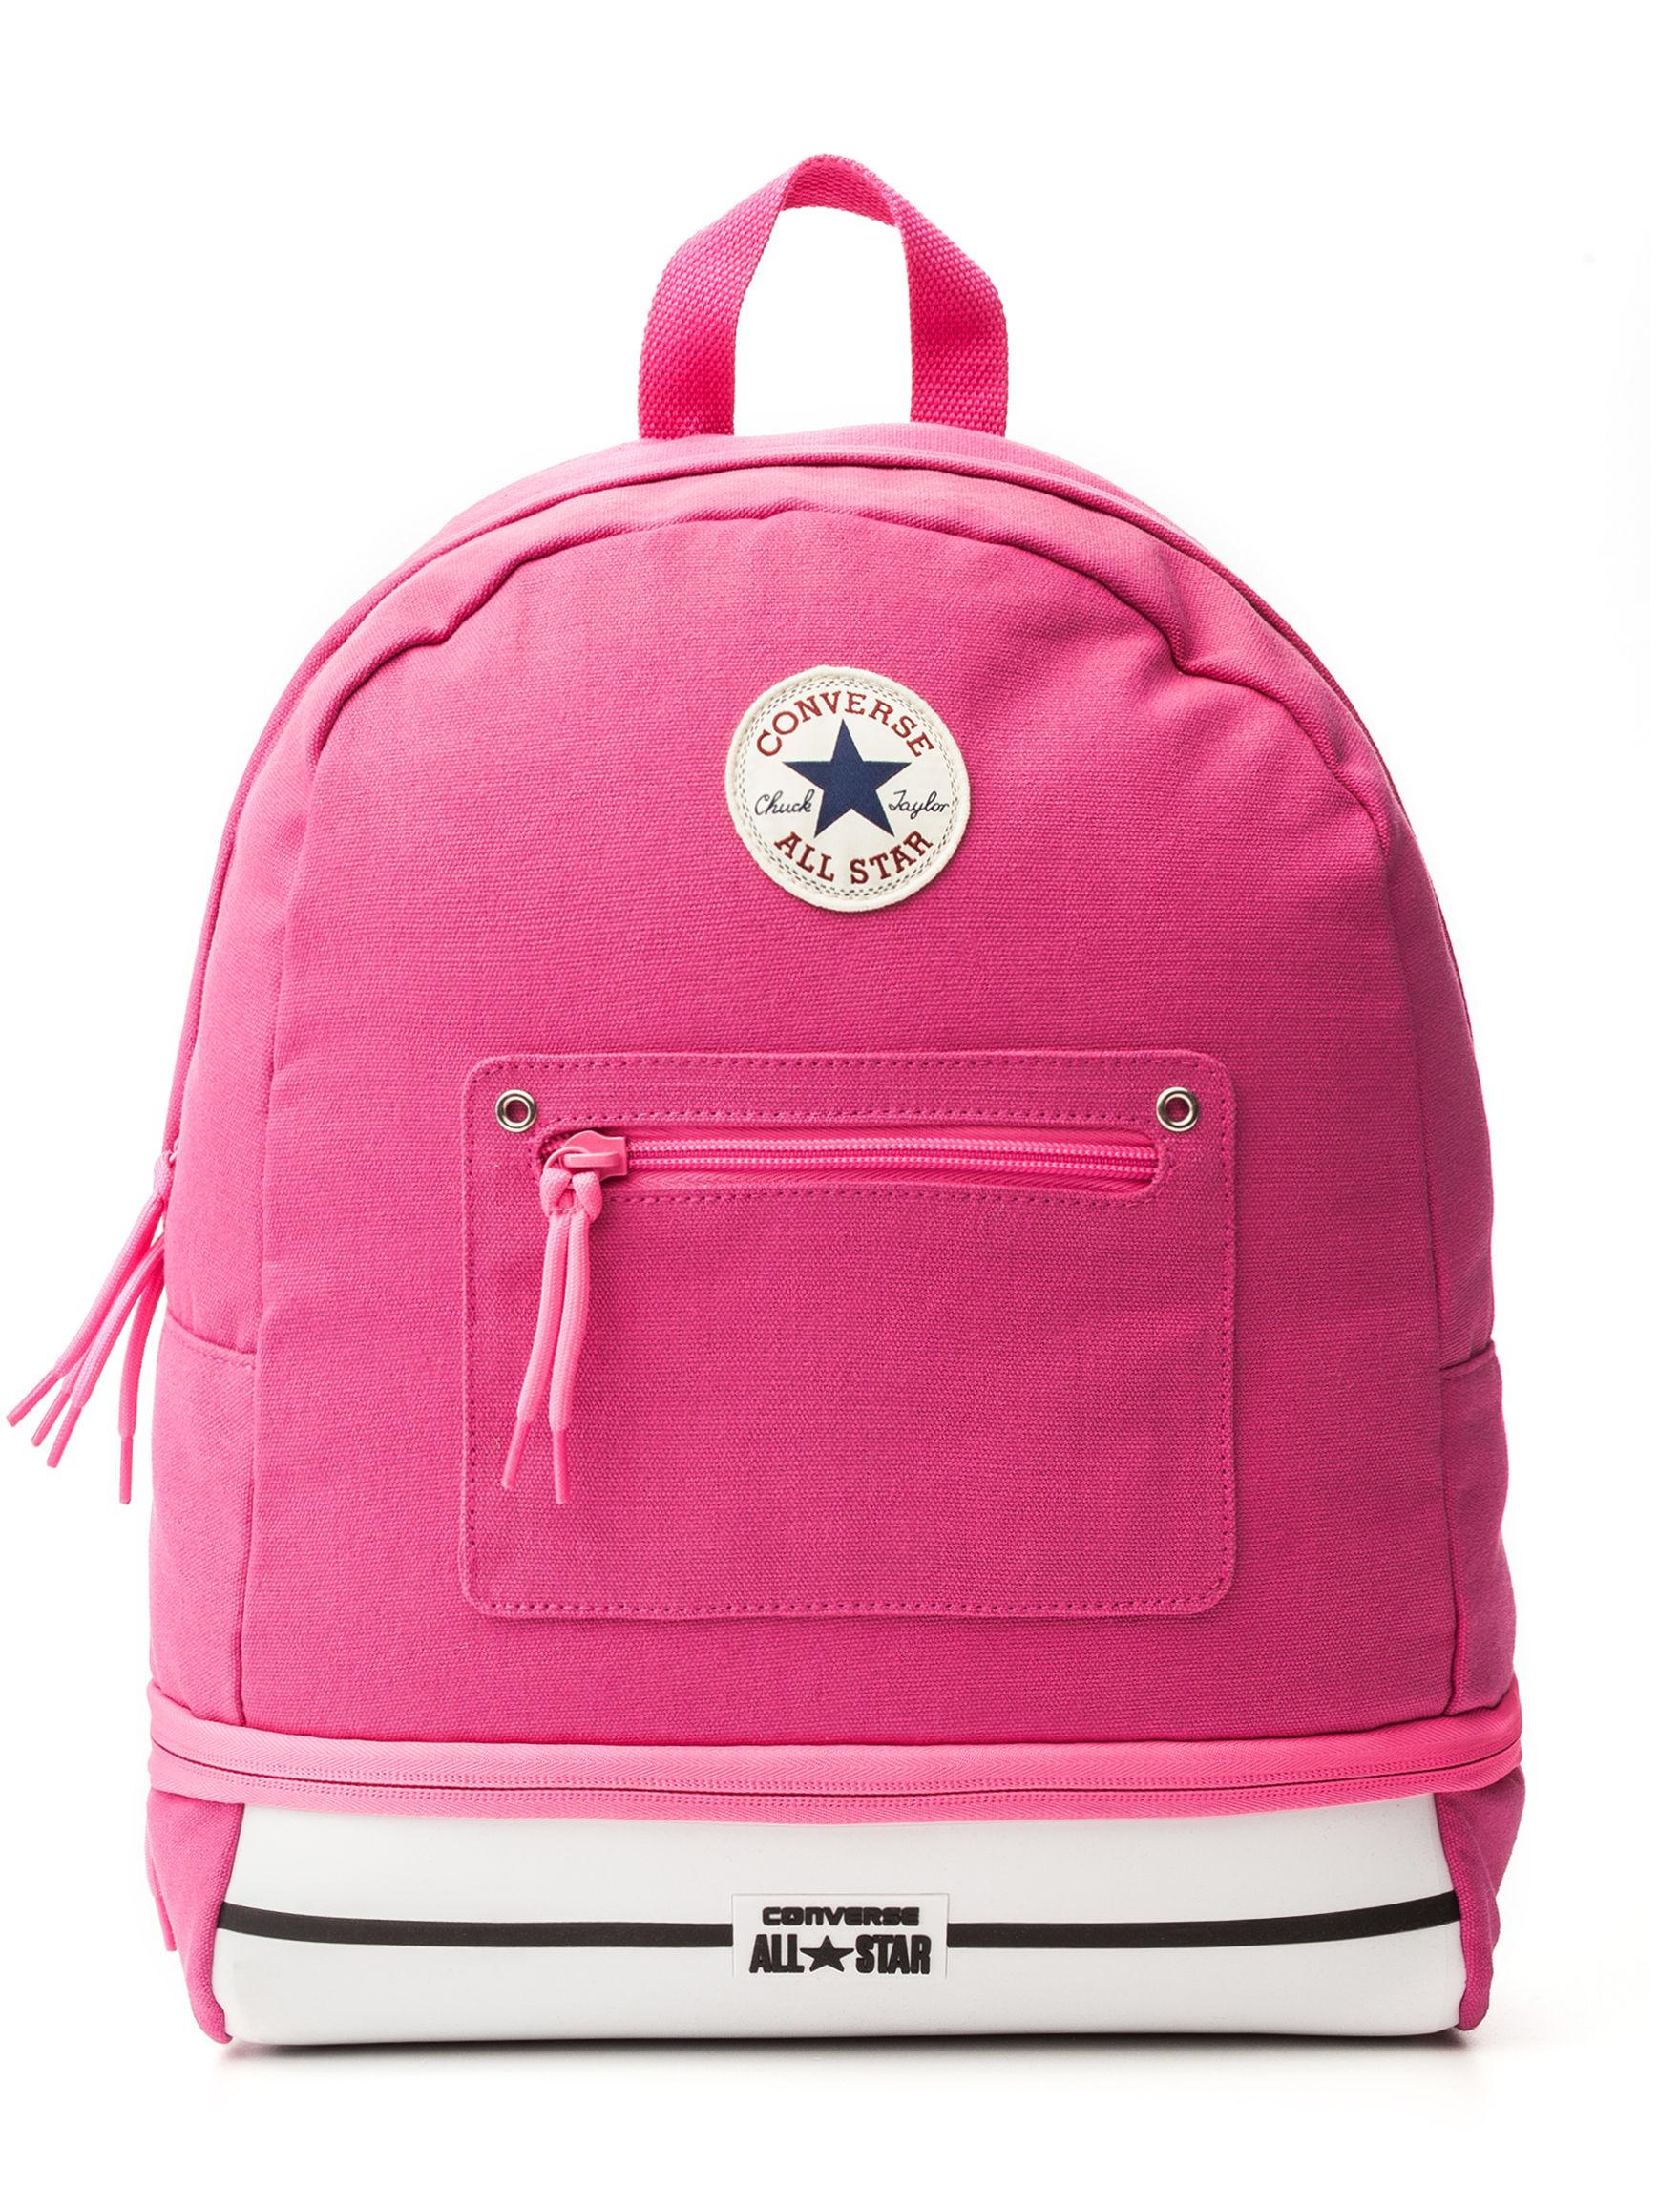 Converse Pink Bookbags & Backpacks